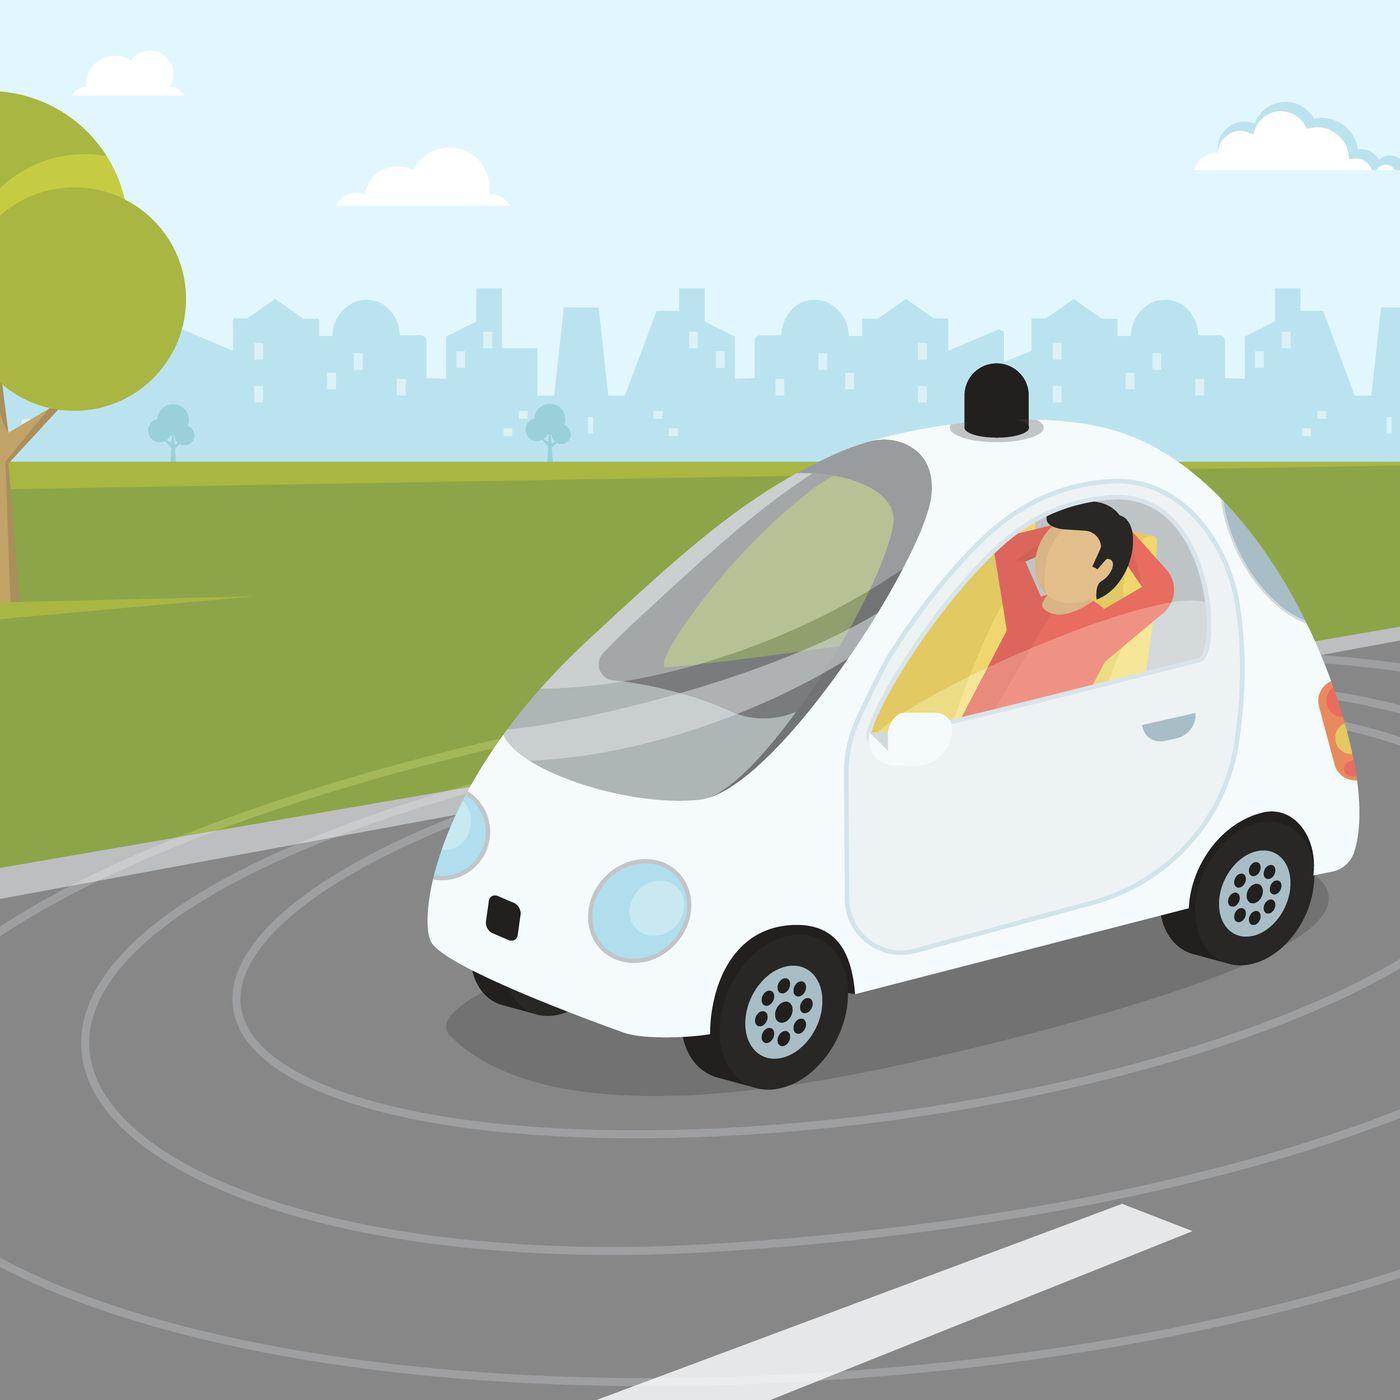 driving school 2016 mod apk v2.0.0